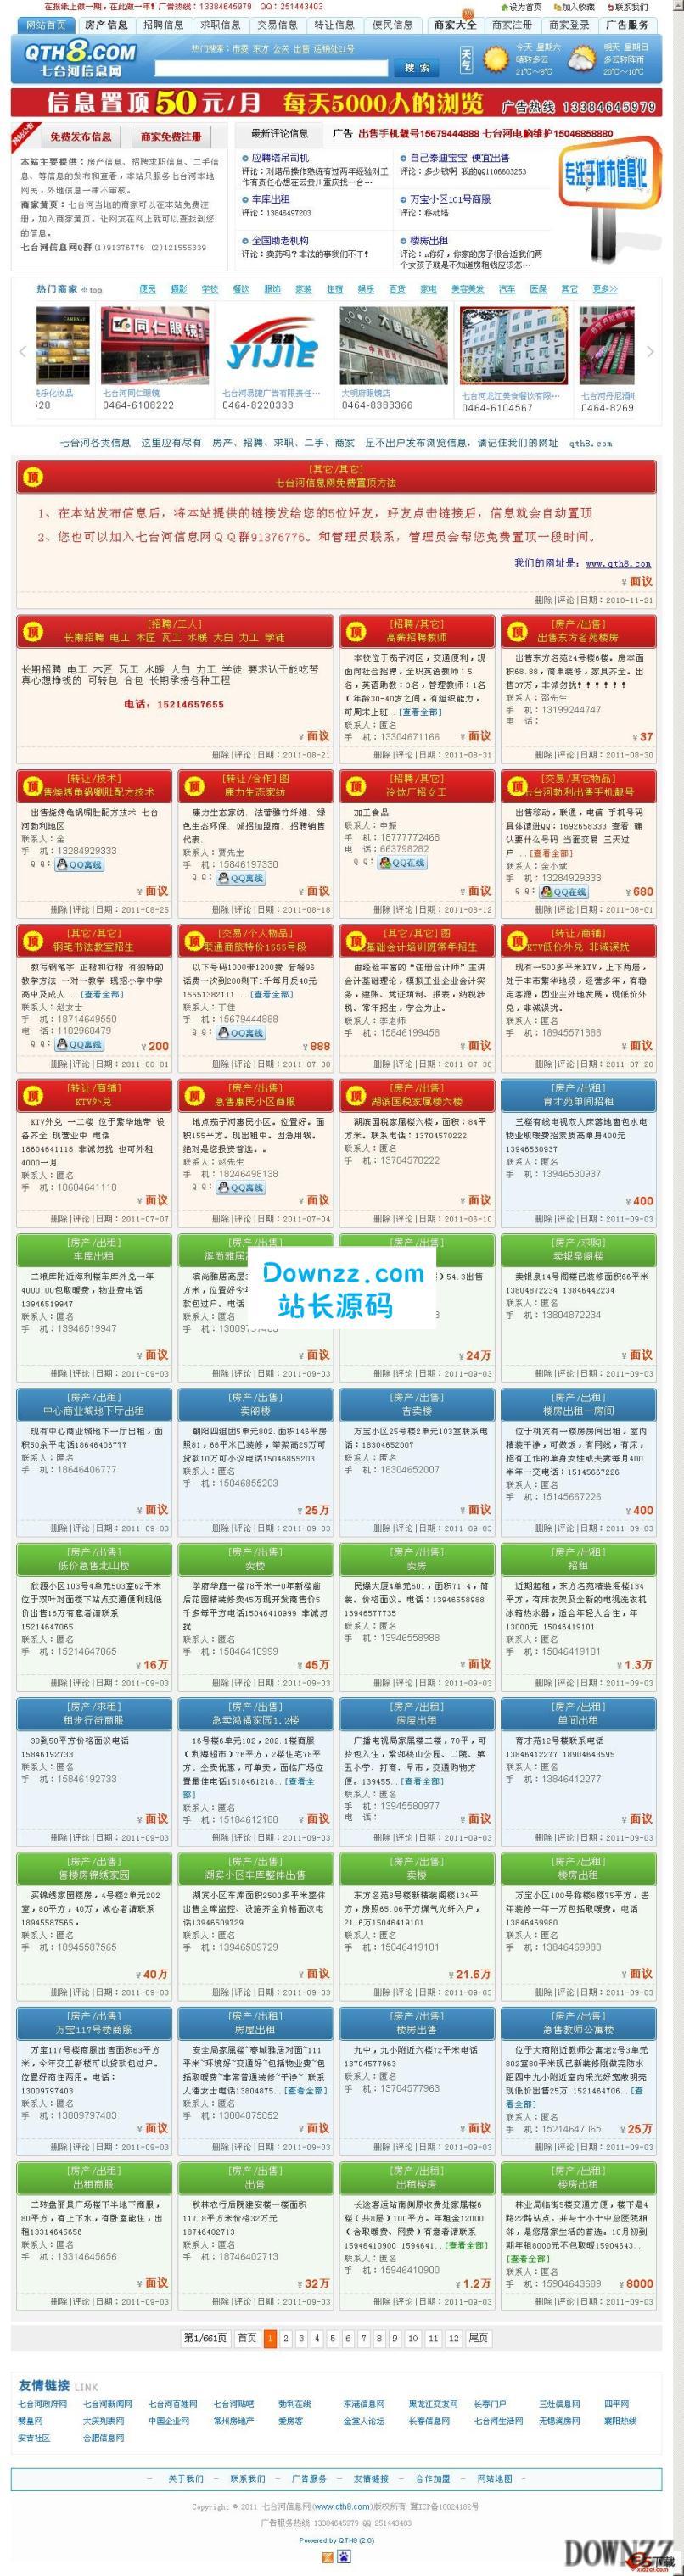 qth8地方分类信息系统v6.1商业版